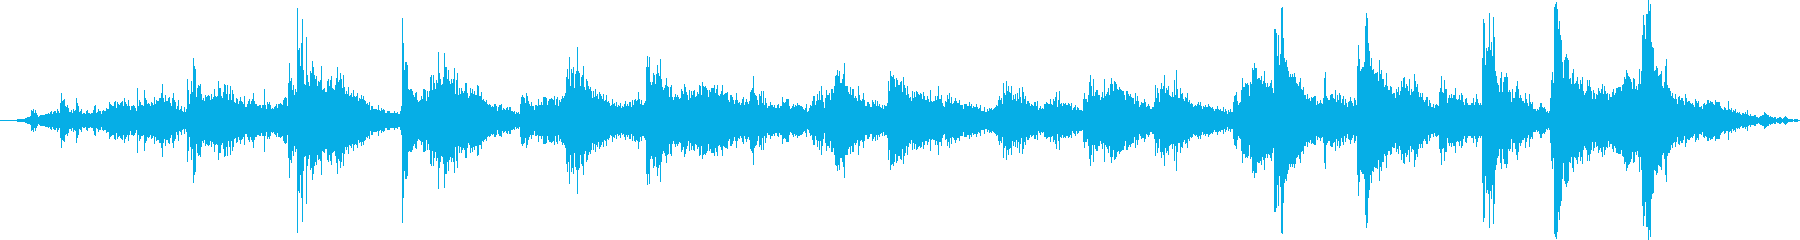 Bmxとラージマウンテンバイク:イ...の再生済みの波形